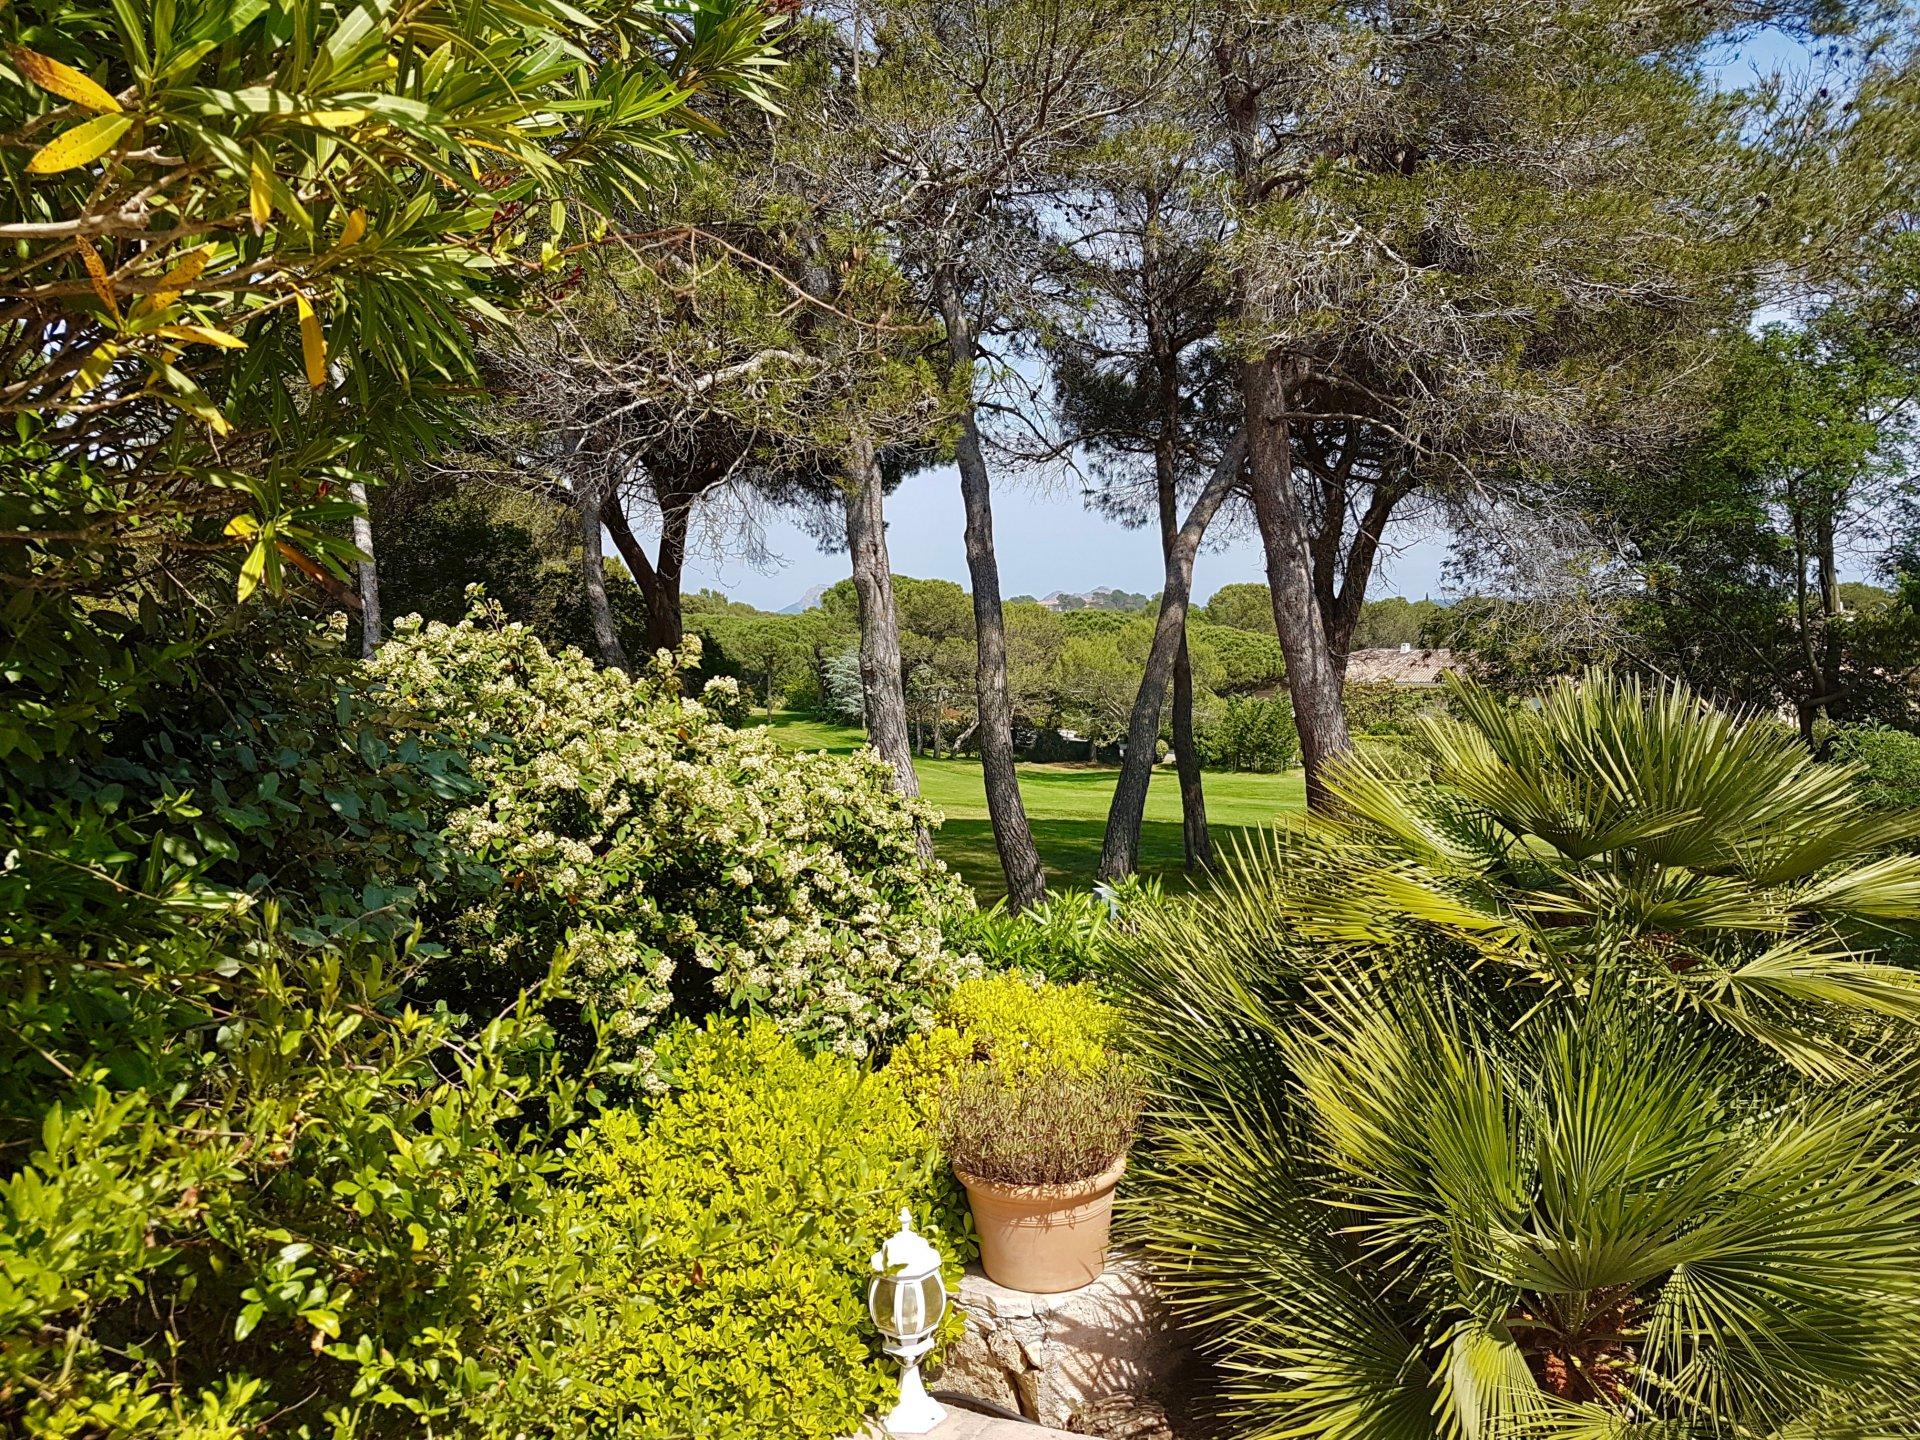 Mooie provencaalse villa aan de golf course van saint raphael - Provencaalse terras ...